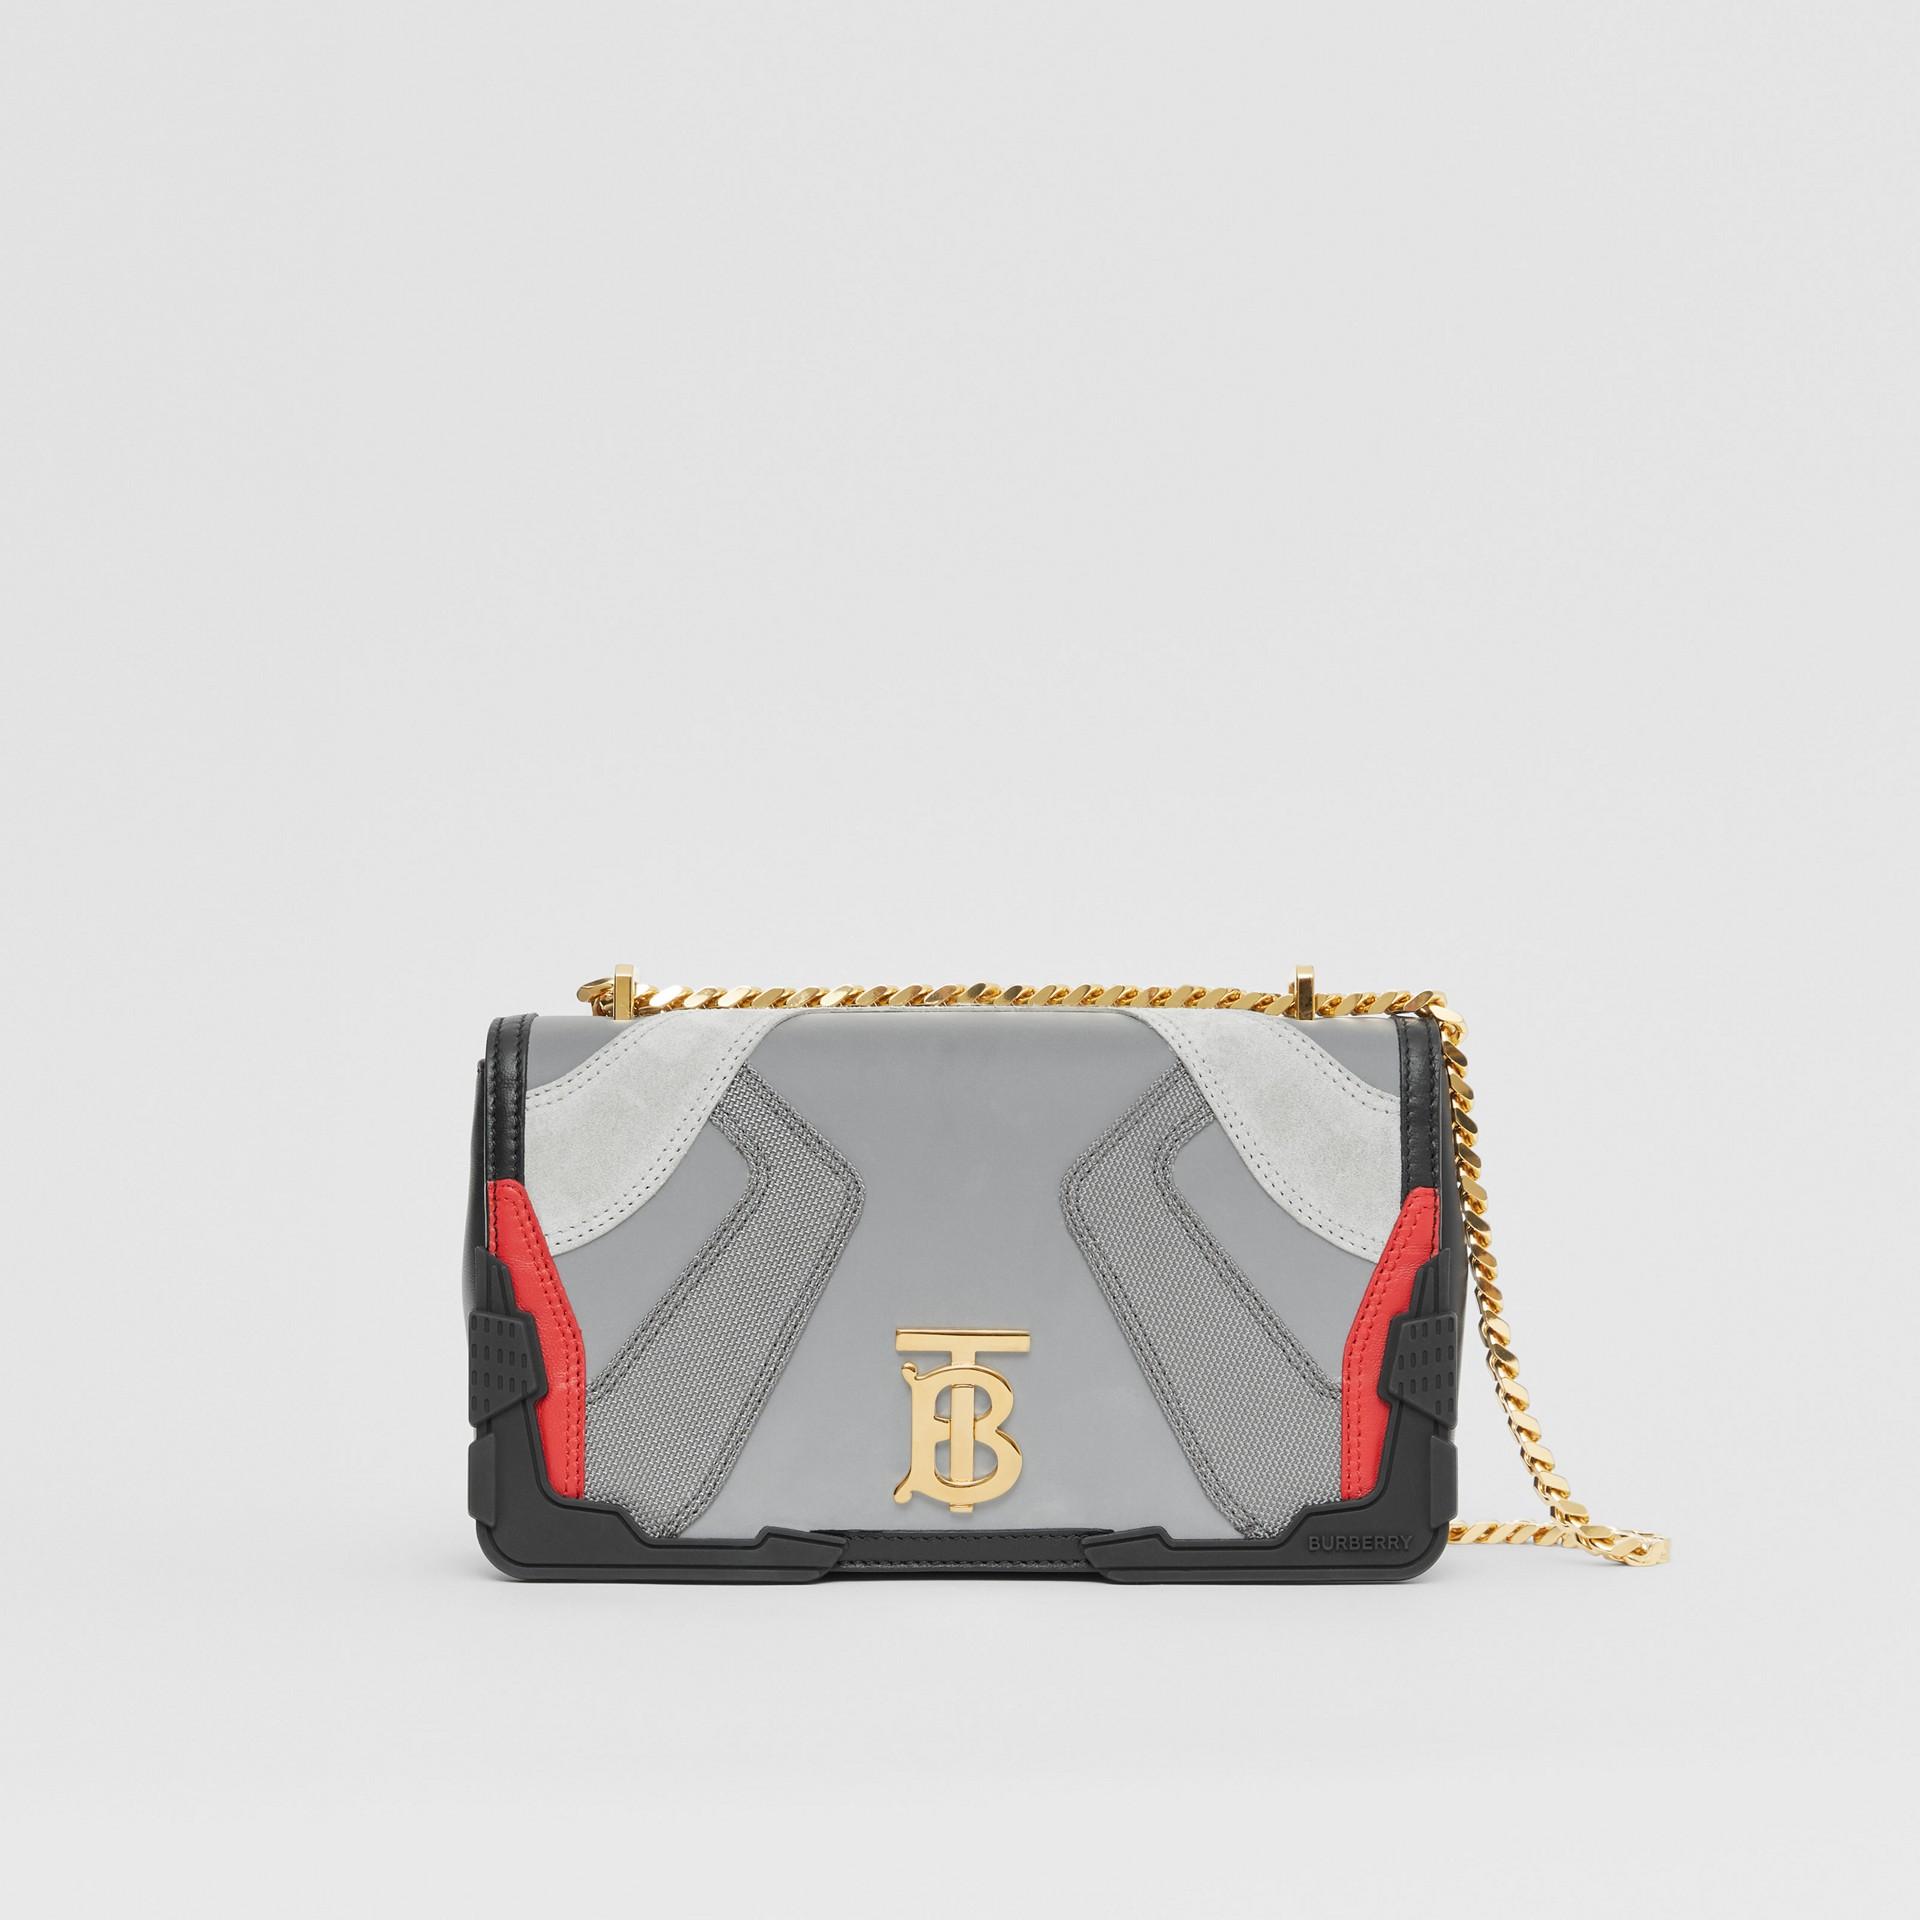 Small Appliqué Leather Lola Bag in Multicolour - Women | Burberry United Kingdom - gallery image 0